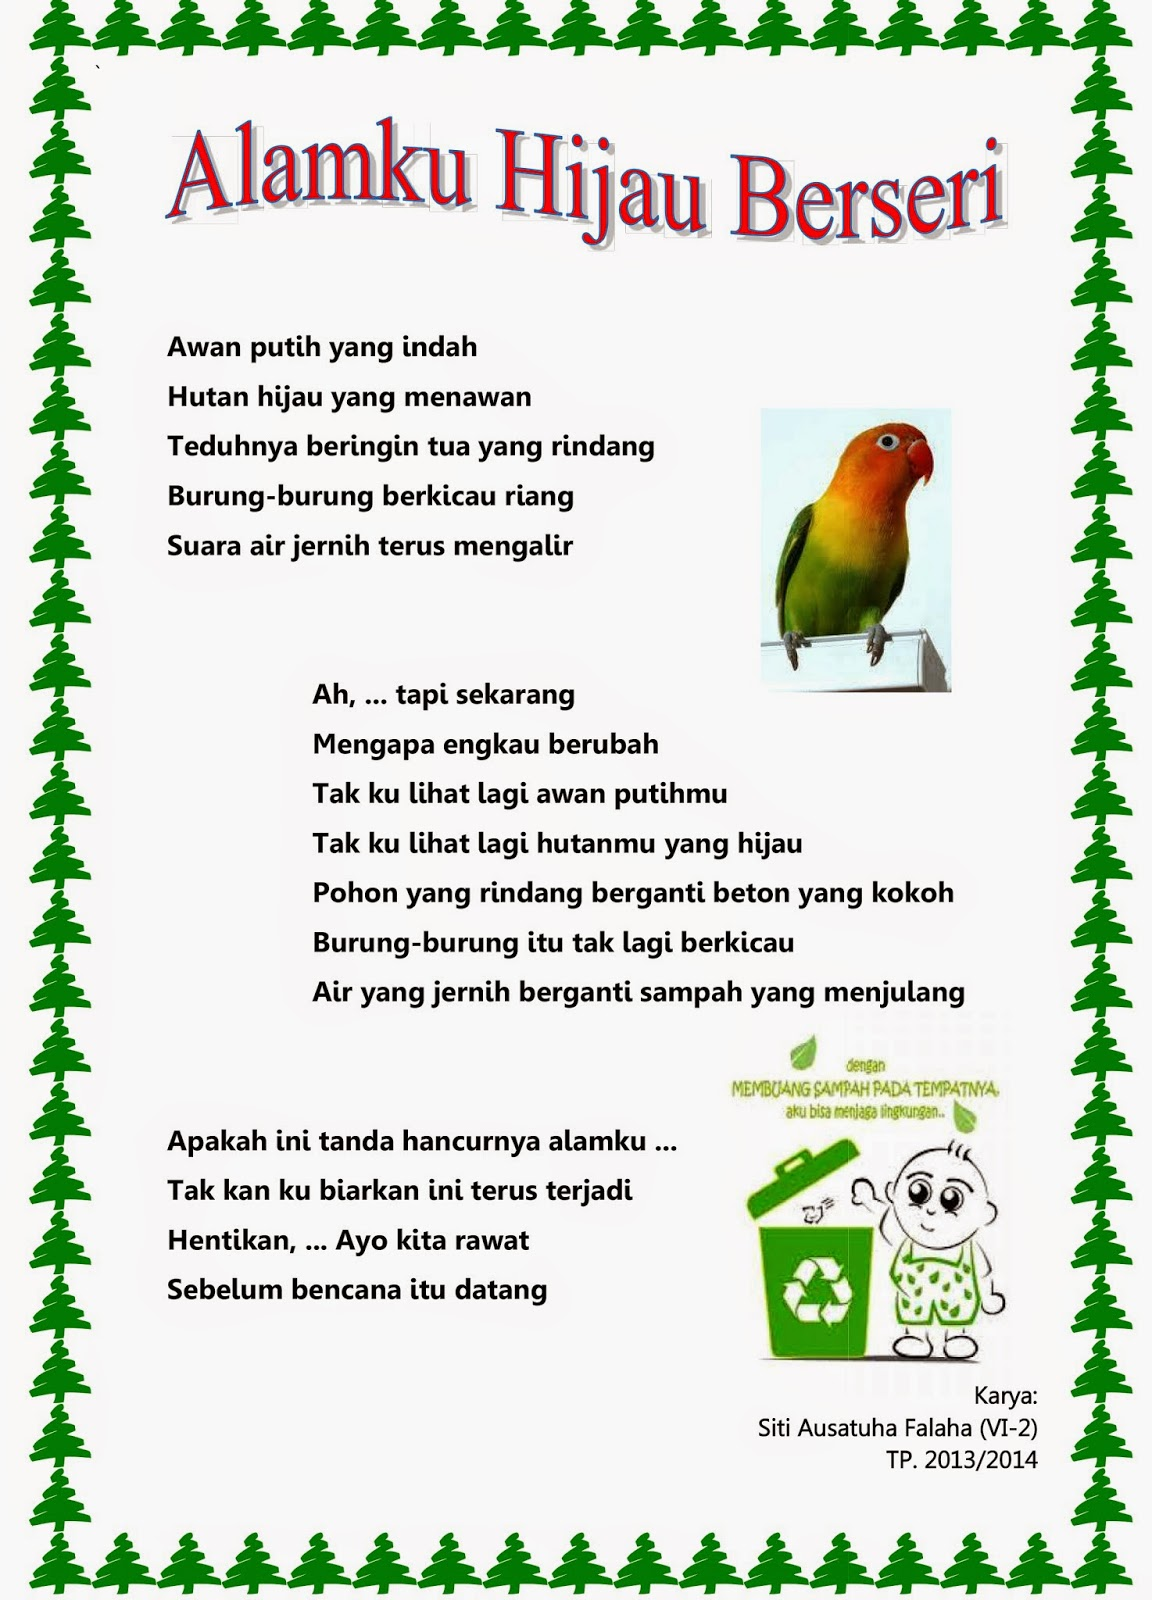 contoh teks puisi lingkungan sekolah